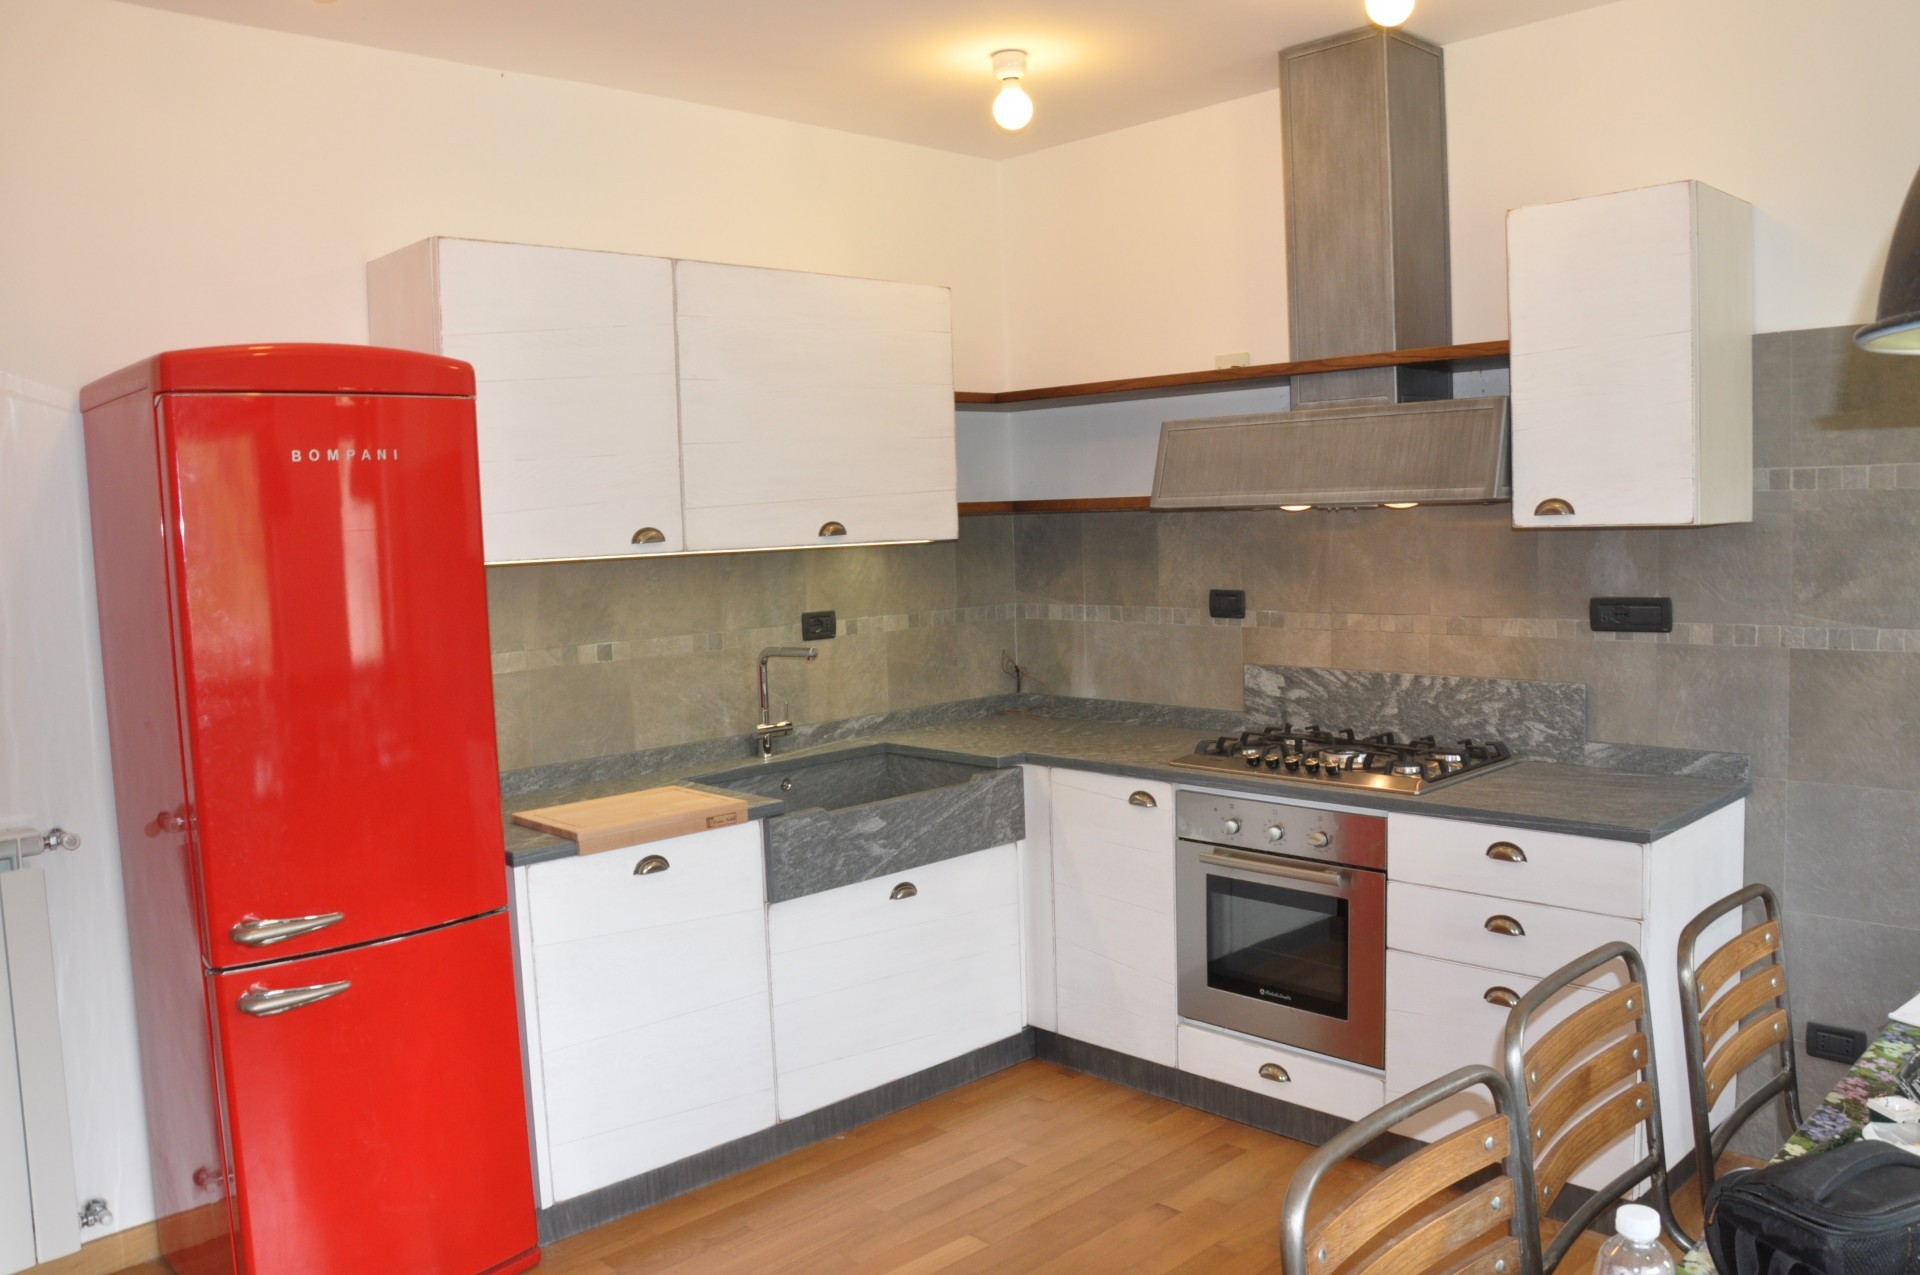 Cucine moderne artigianali in legno fadini mobili cerea verona - Cucine moderne in legno naturale ...